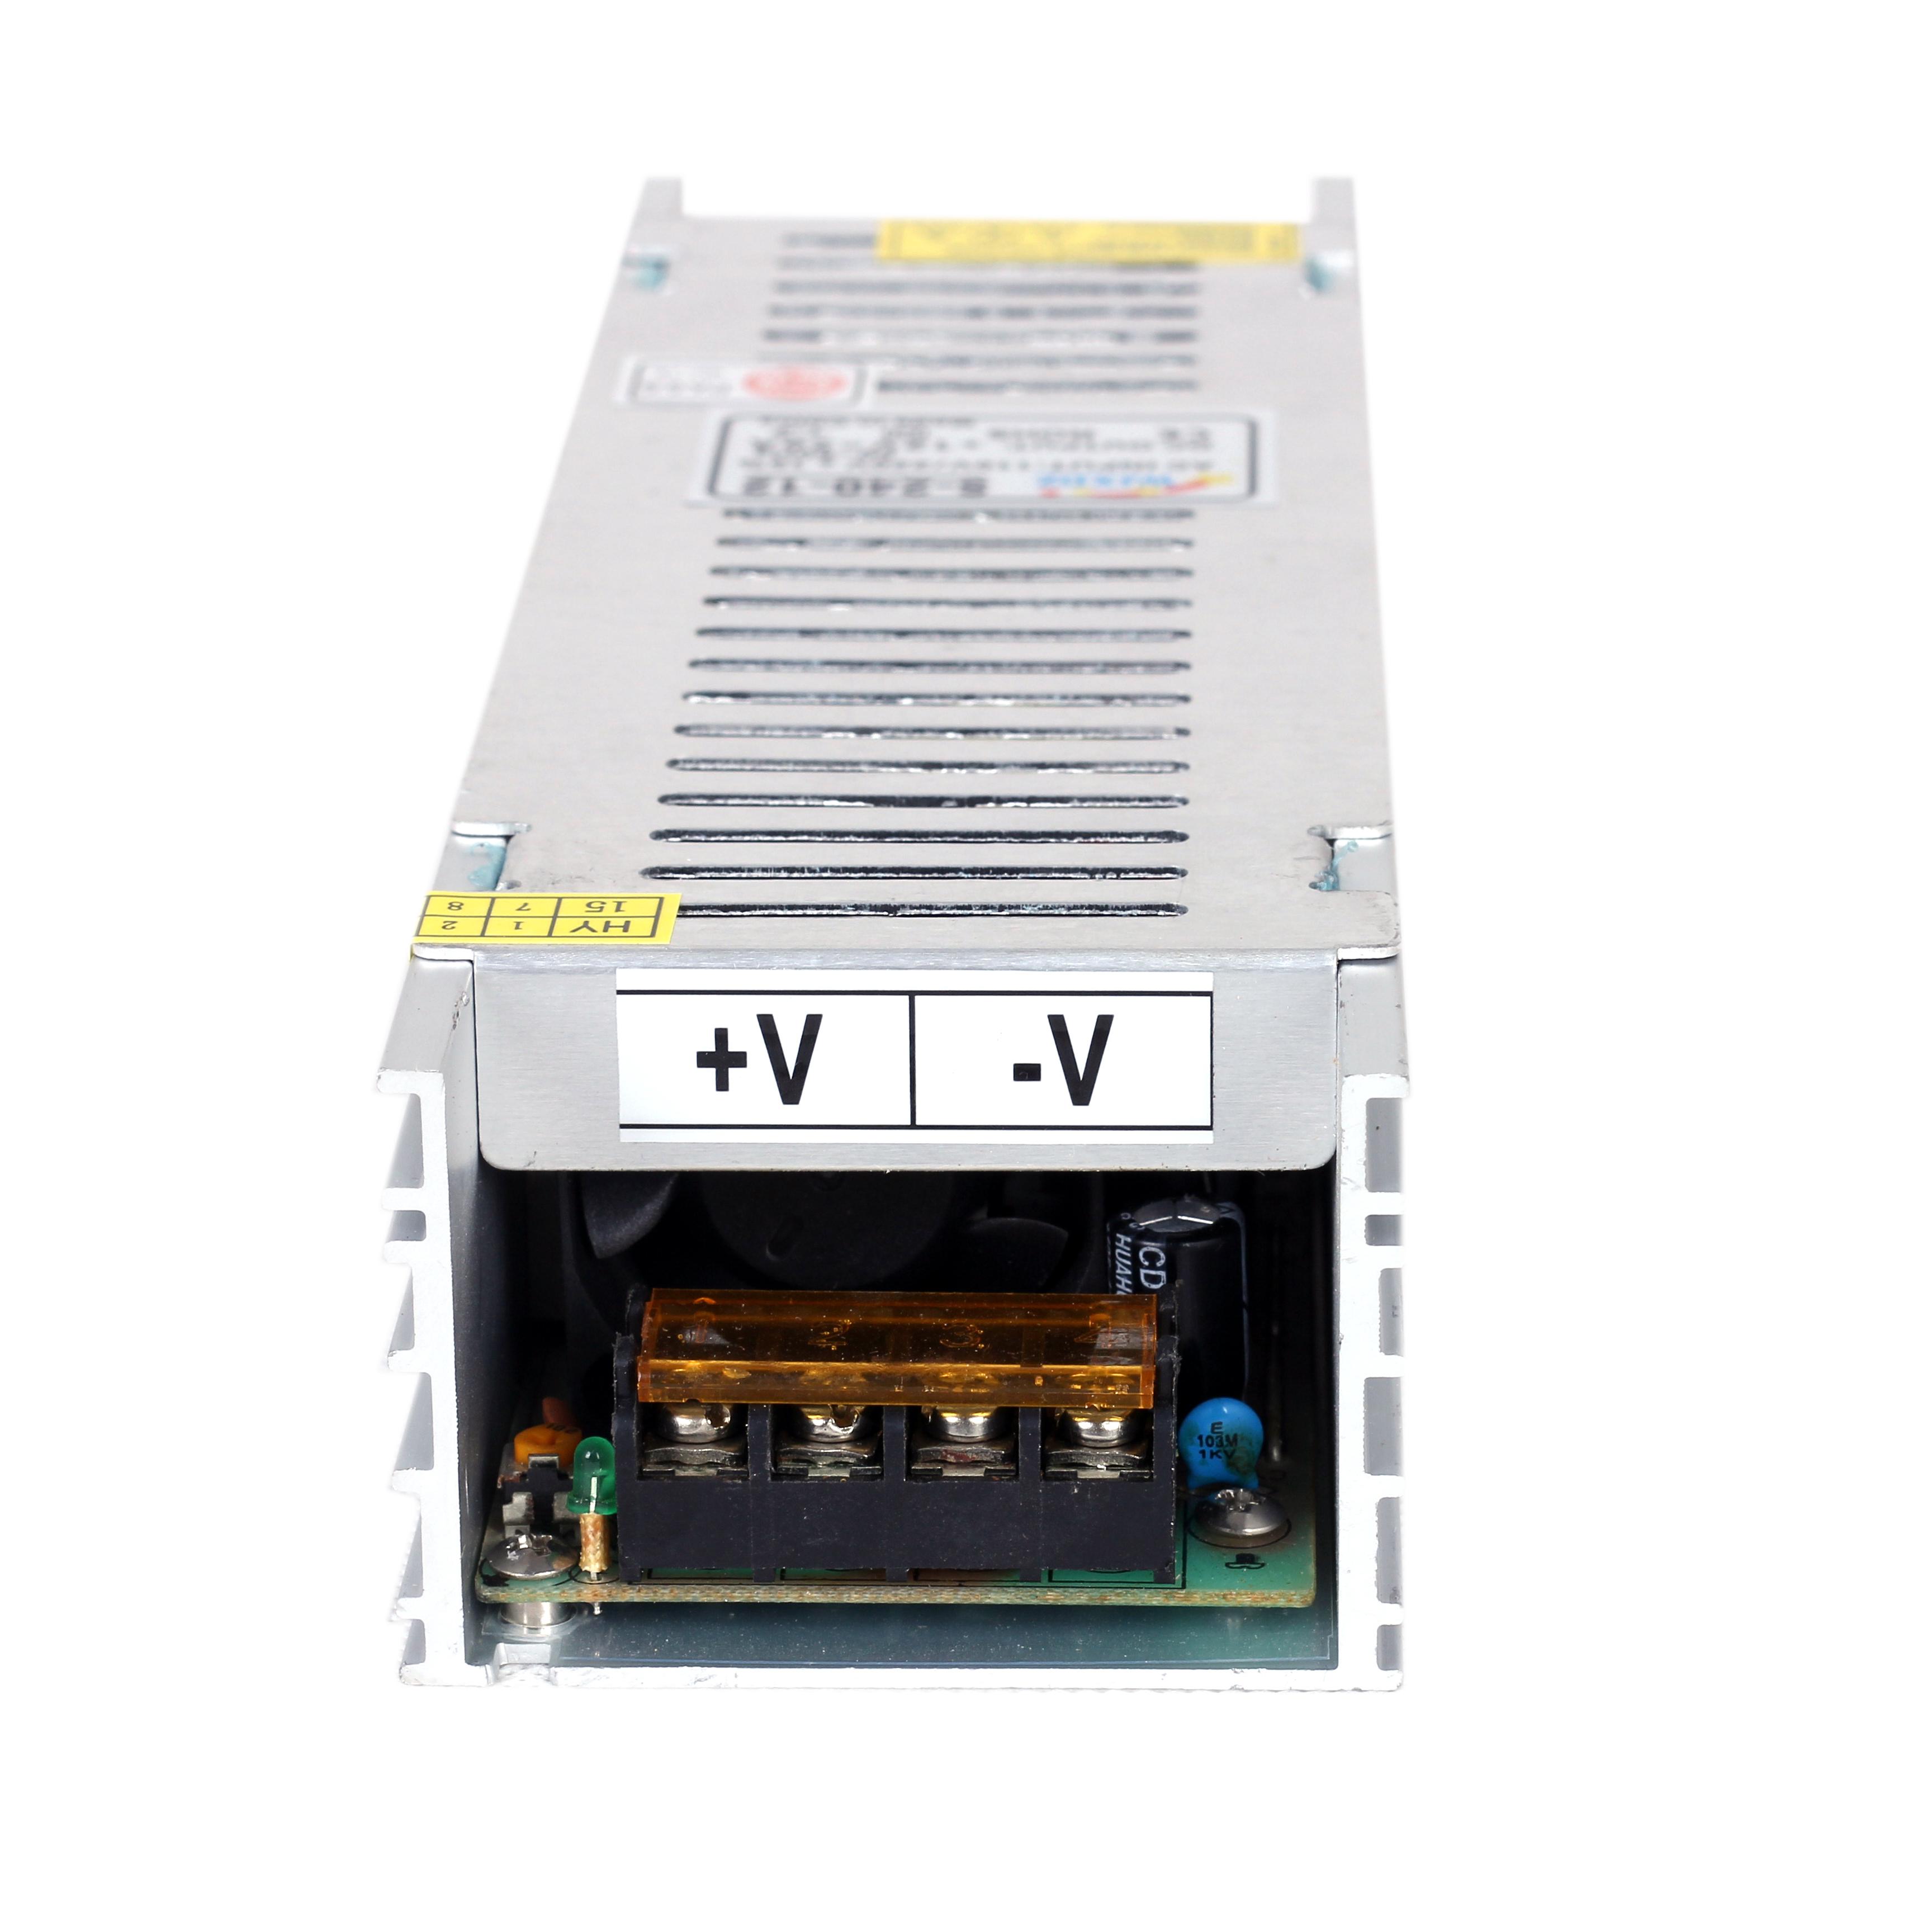 ac to dc Led driver 12V 20A 250W slim led power supply for led strip led module led advertising lamp cctv camera